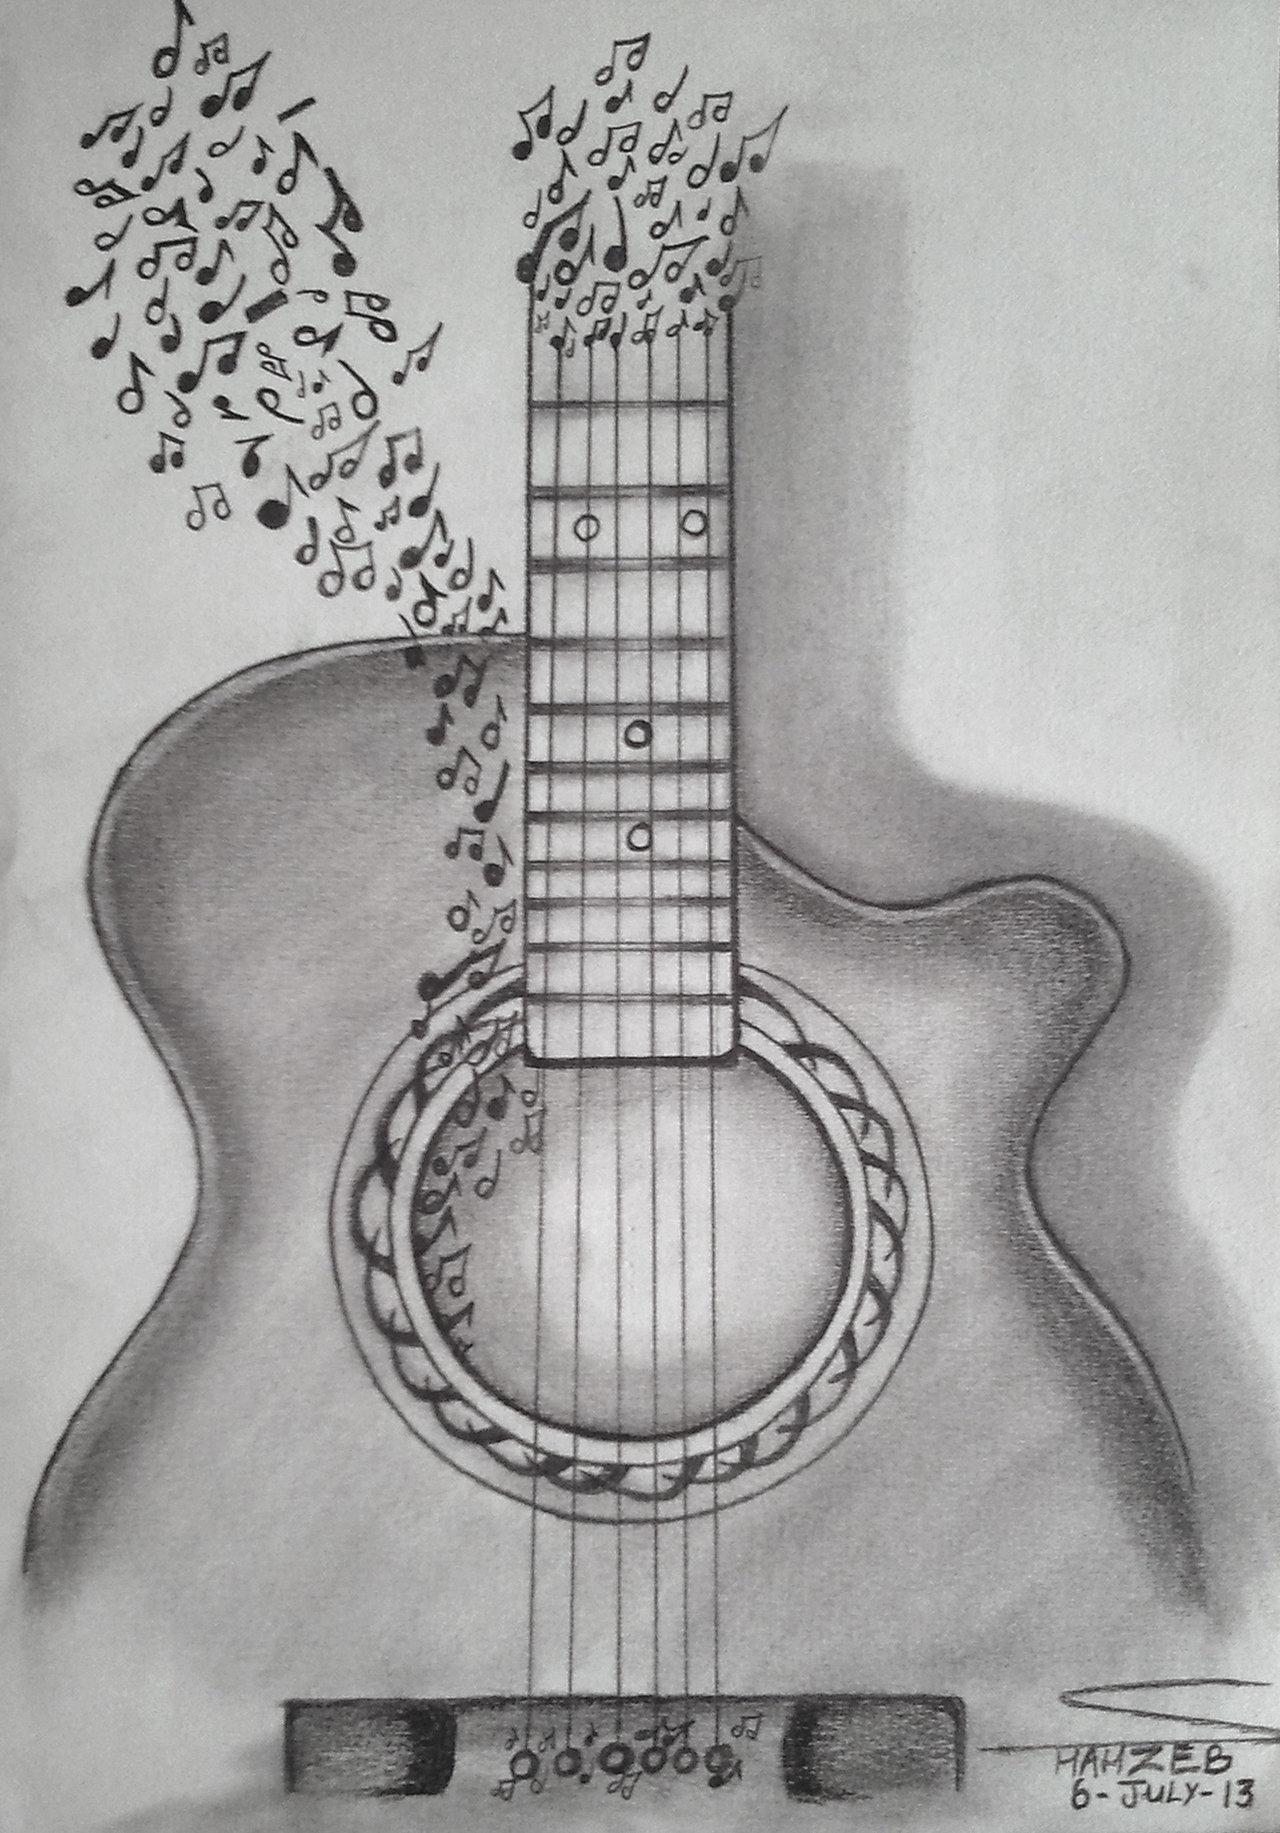 Drawn music Easy More art Pencil Search